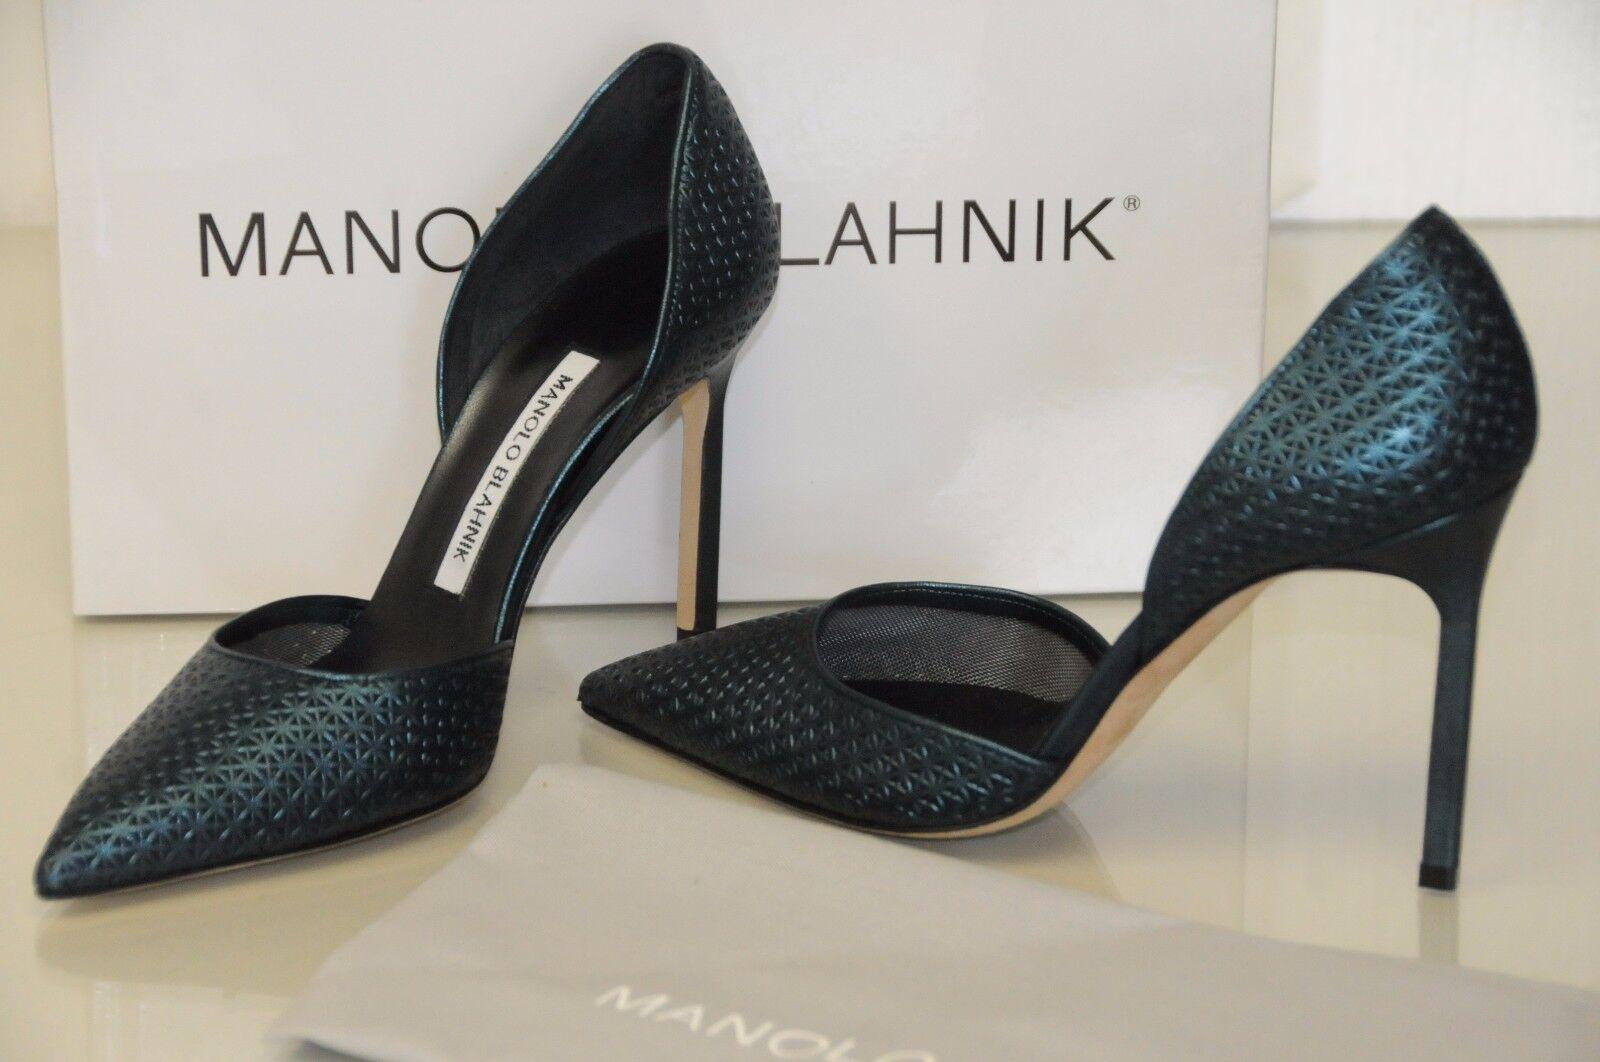 830 New Manolo Blahnik Tayler Tayleradamesh Green Metallic Pump Dorsay shoes 36